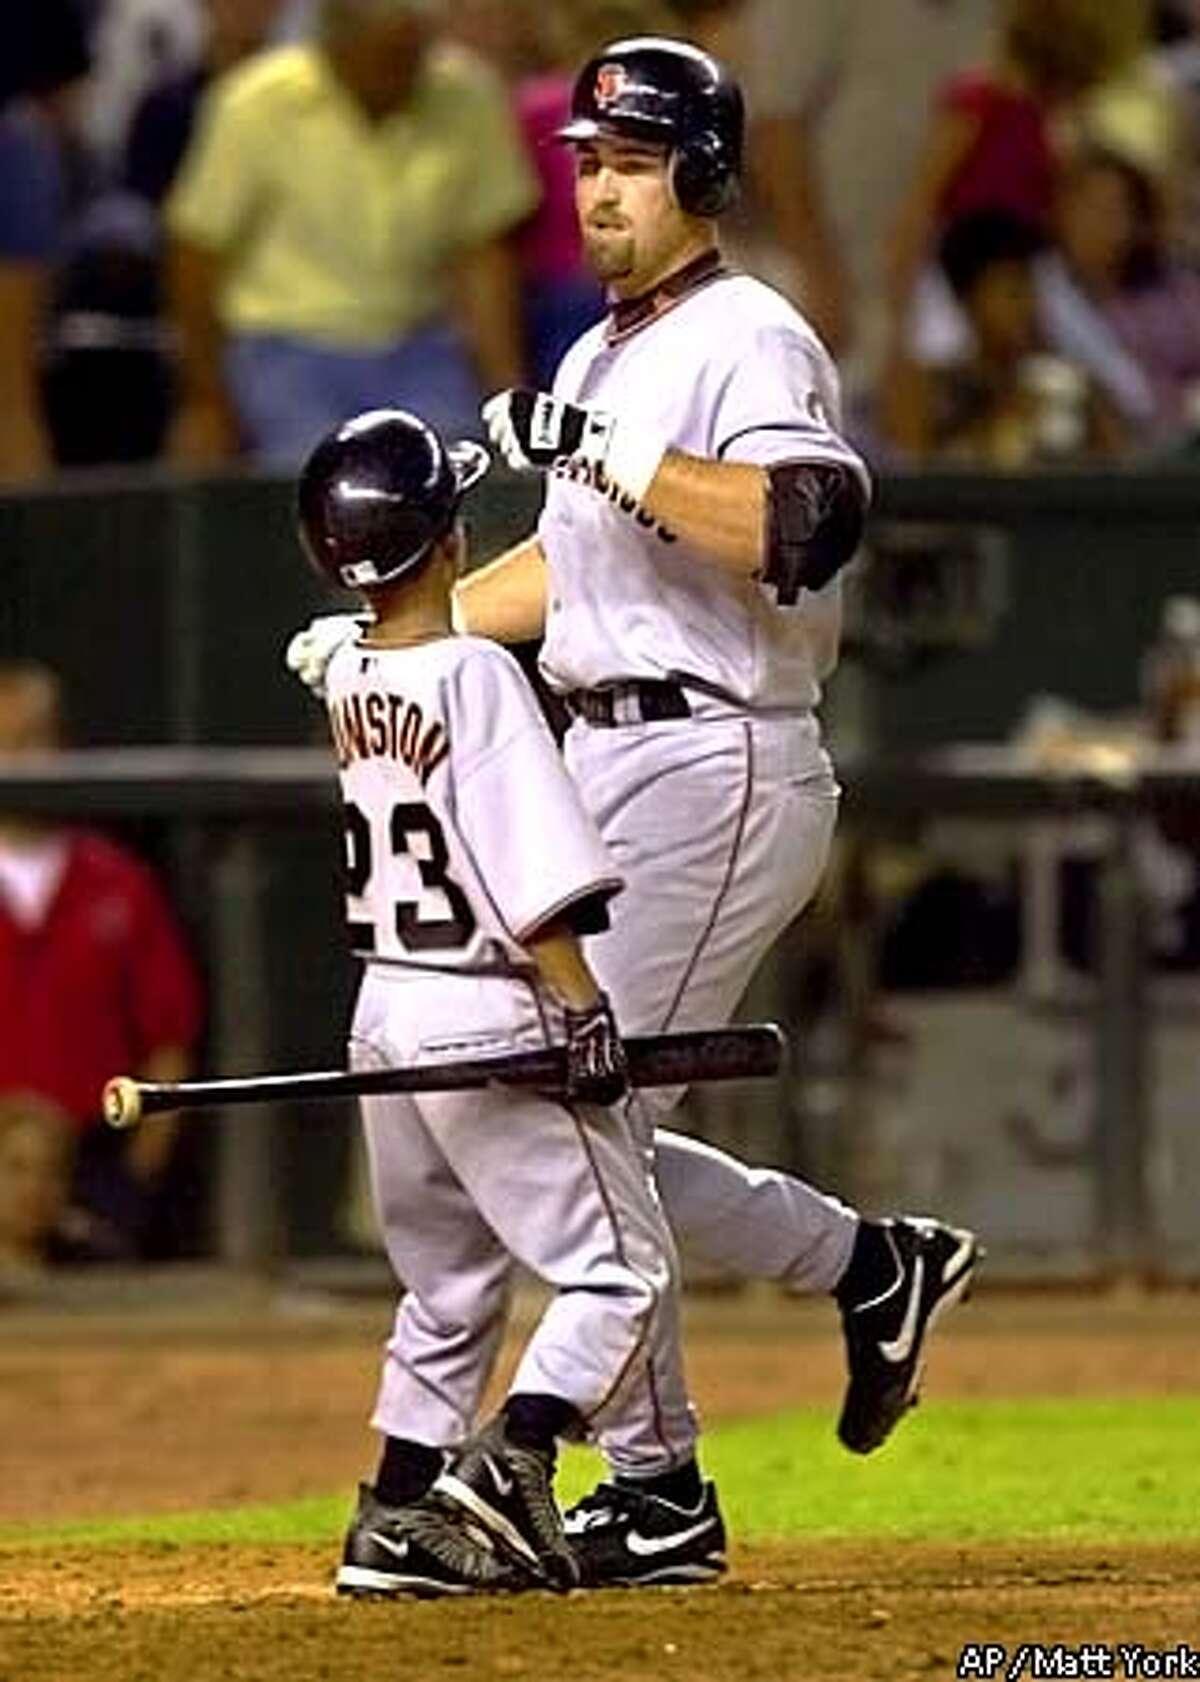 San Francisco Giants' Rich Aurilia is congratulated by bat boy Shawon Dunston Jr. after hiting a two-run home run against the Arizona Diamondbacks during the fifth inning at Bank One Ballpark in Phoenix Saturday, July 28, 2001.(AP Photo/Matt York)